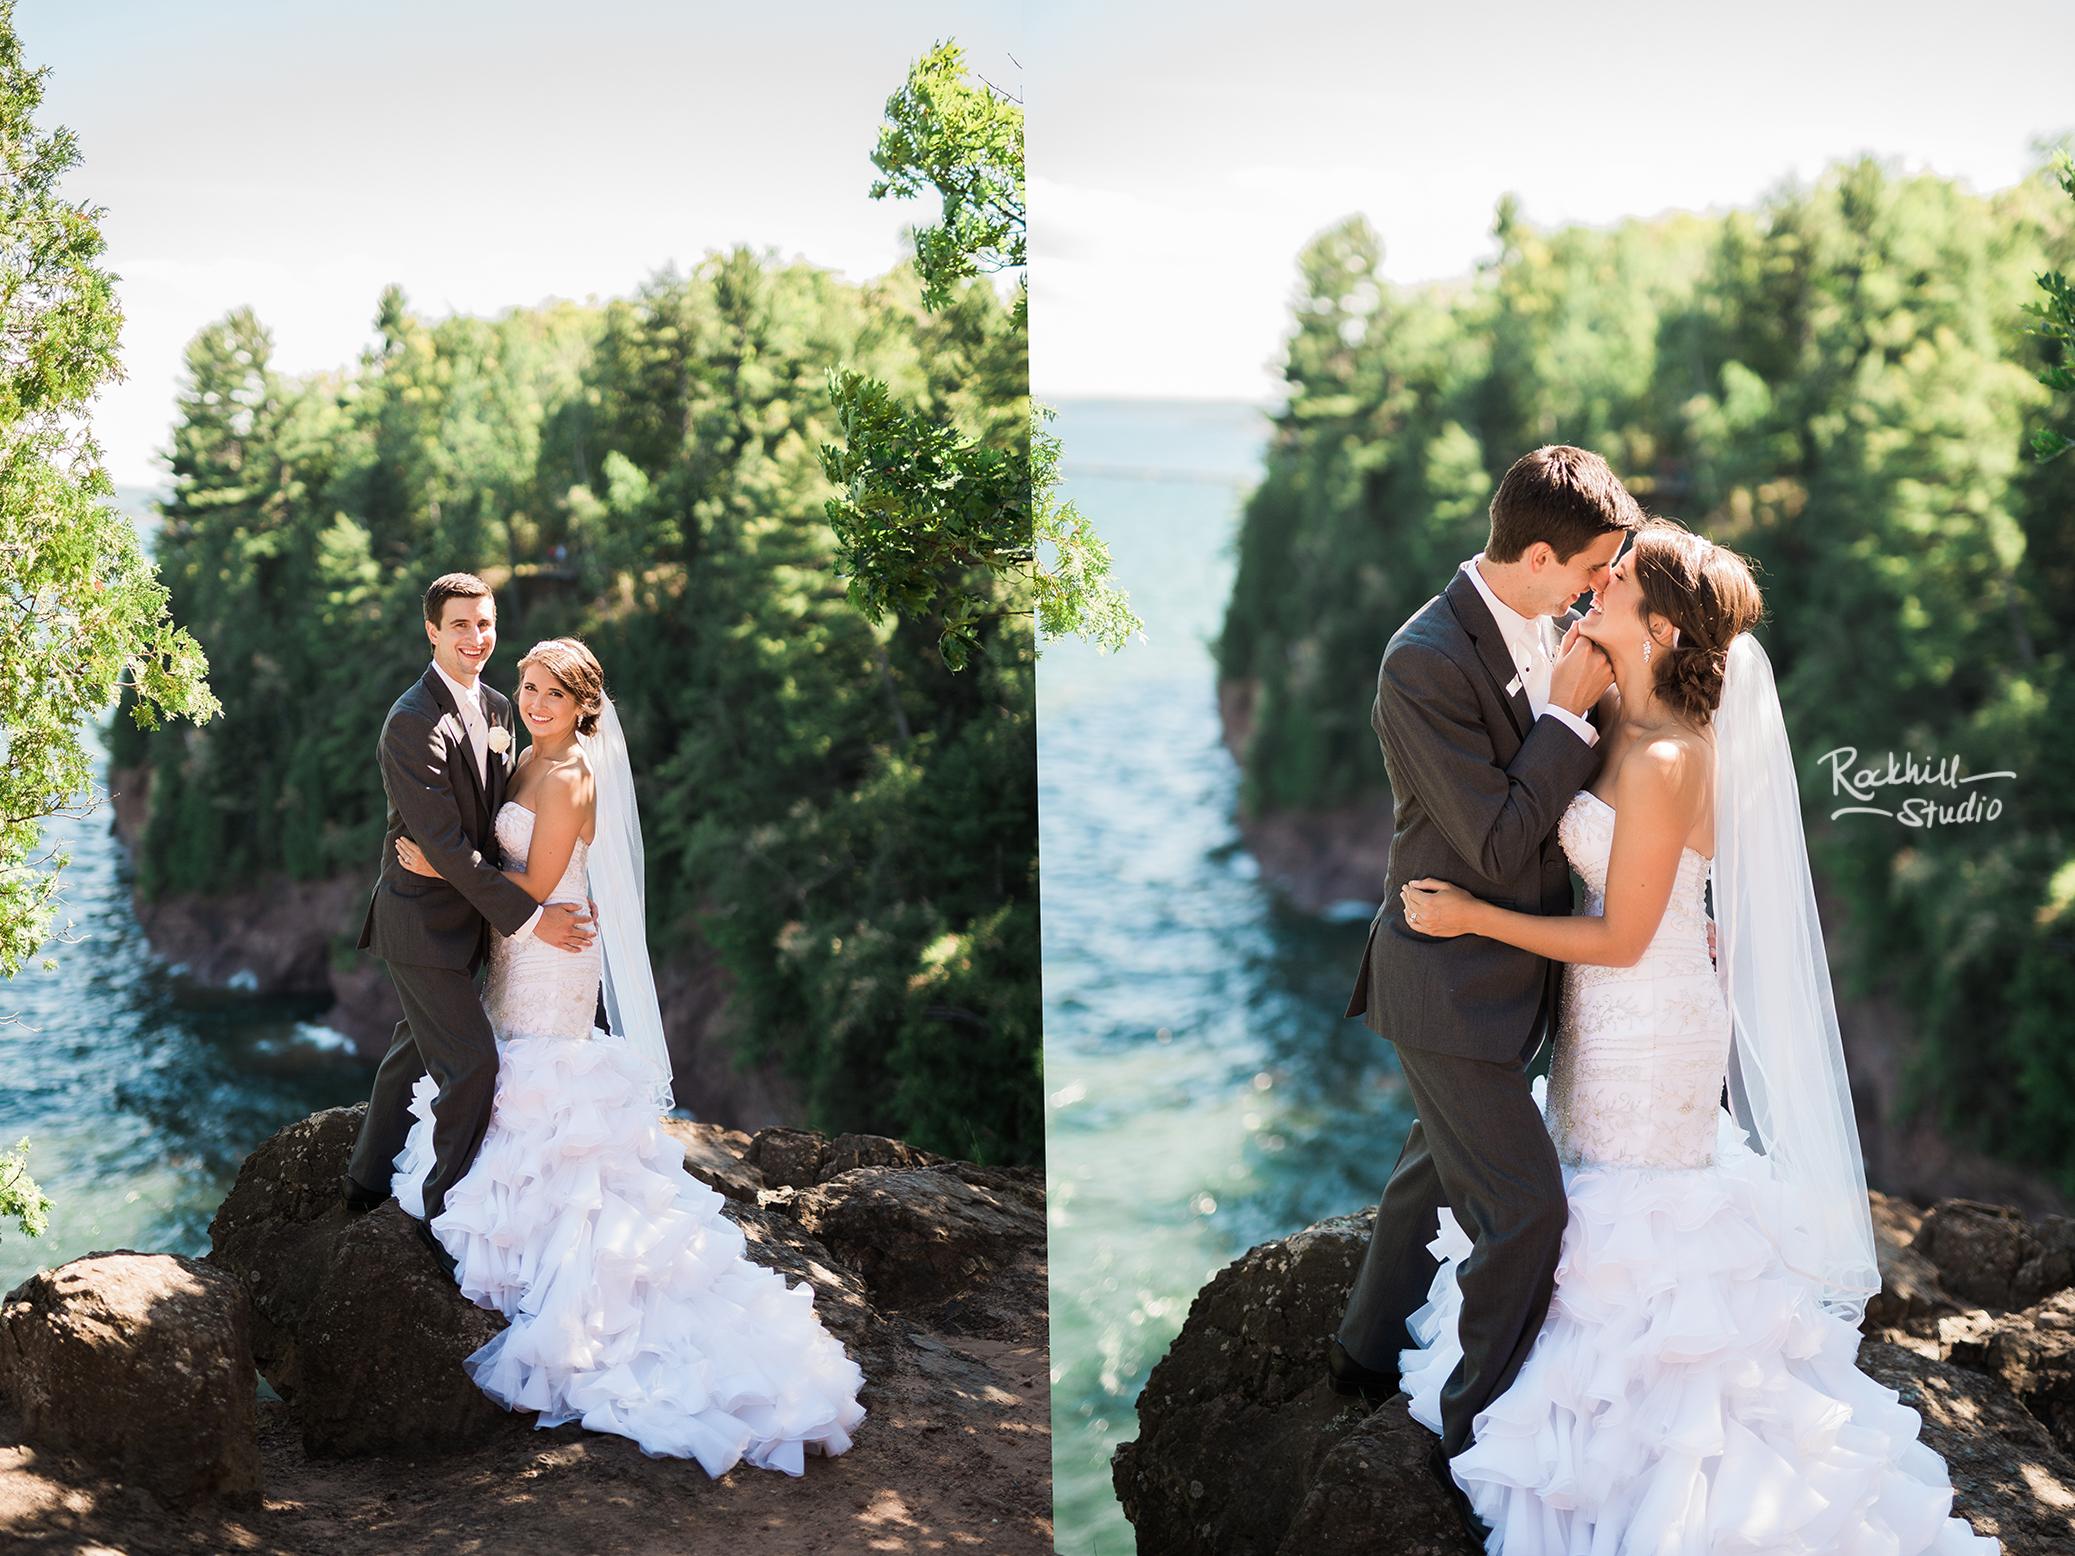 marquette-wedding-upper-peninsula-northern-michigan-wedding-ck-photography-wedding-party-23.jpg